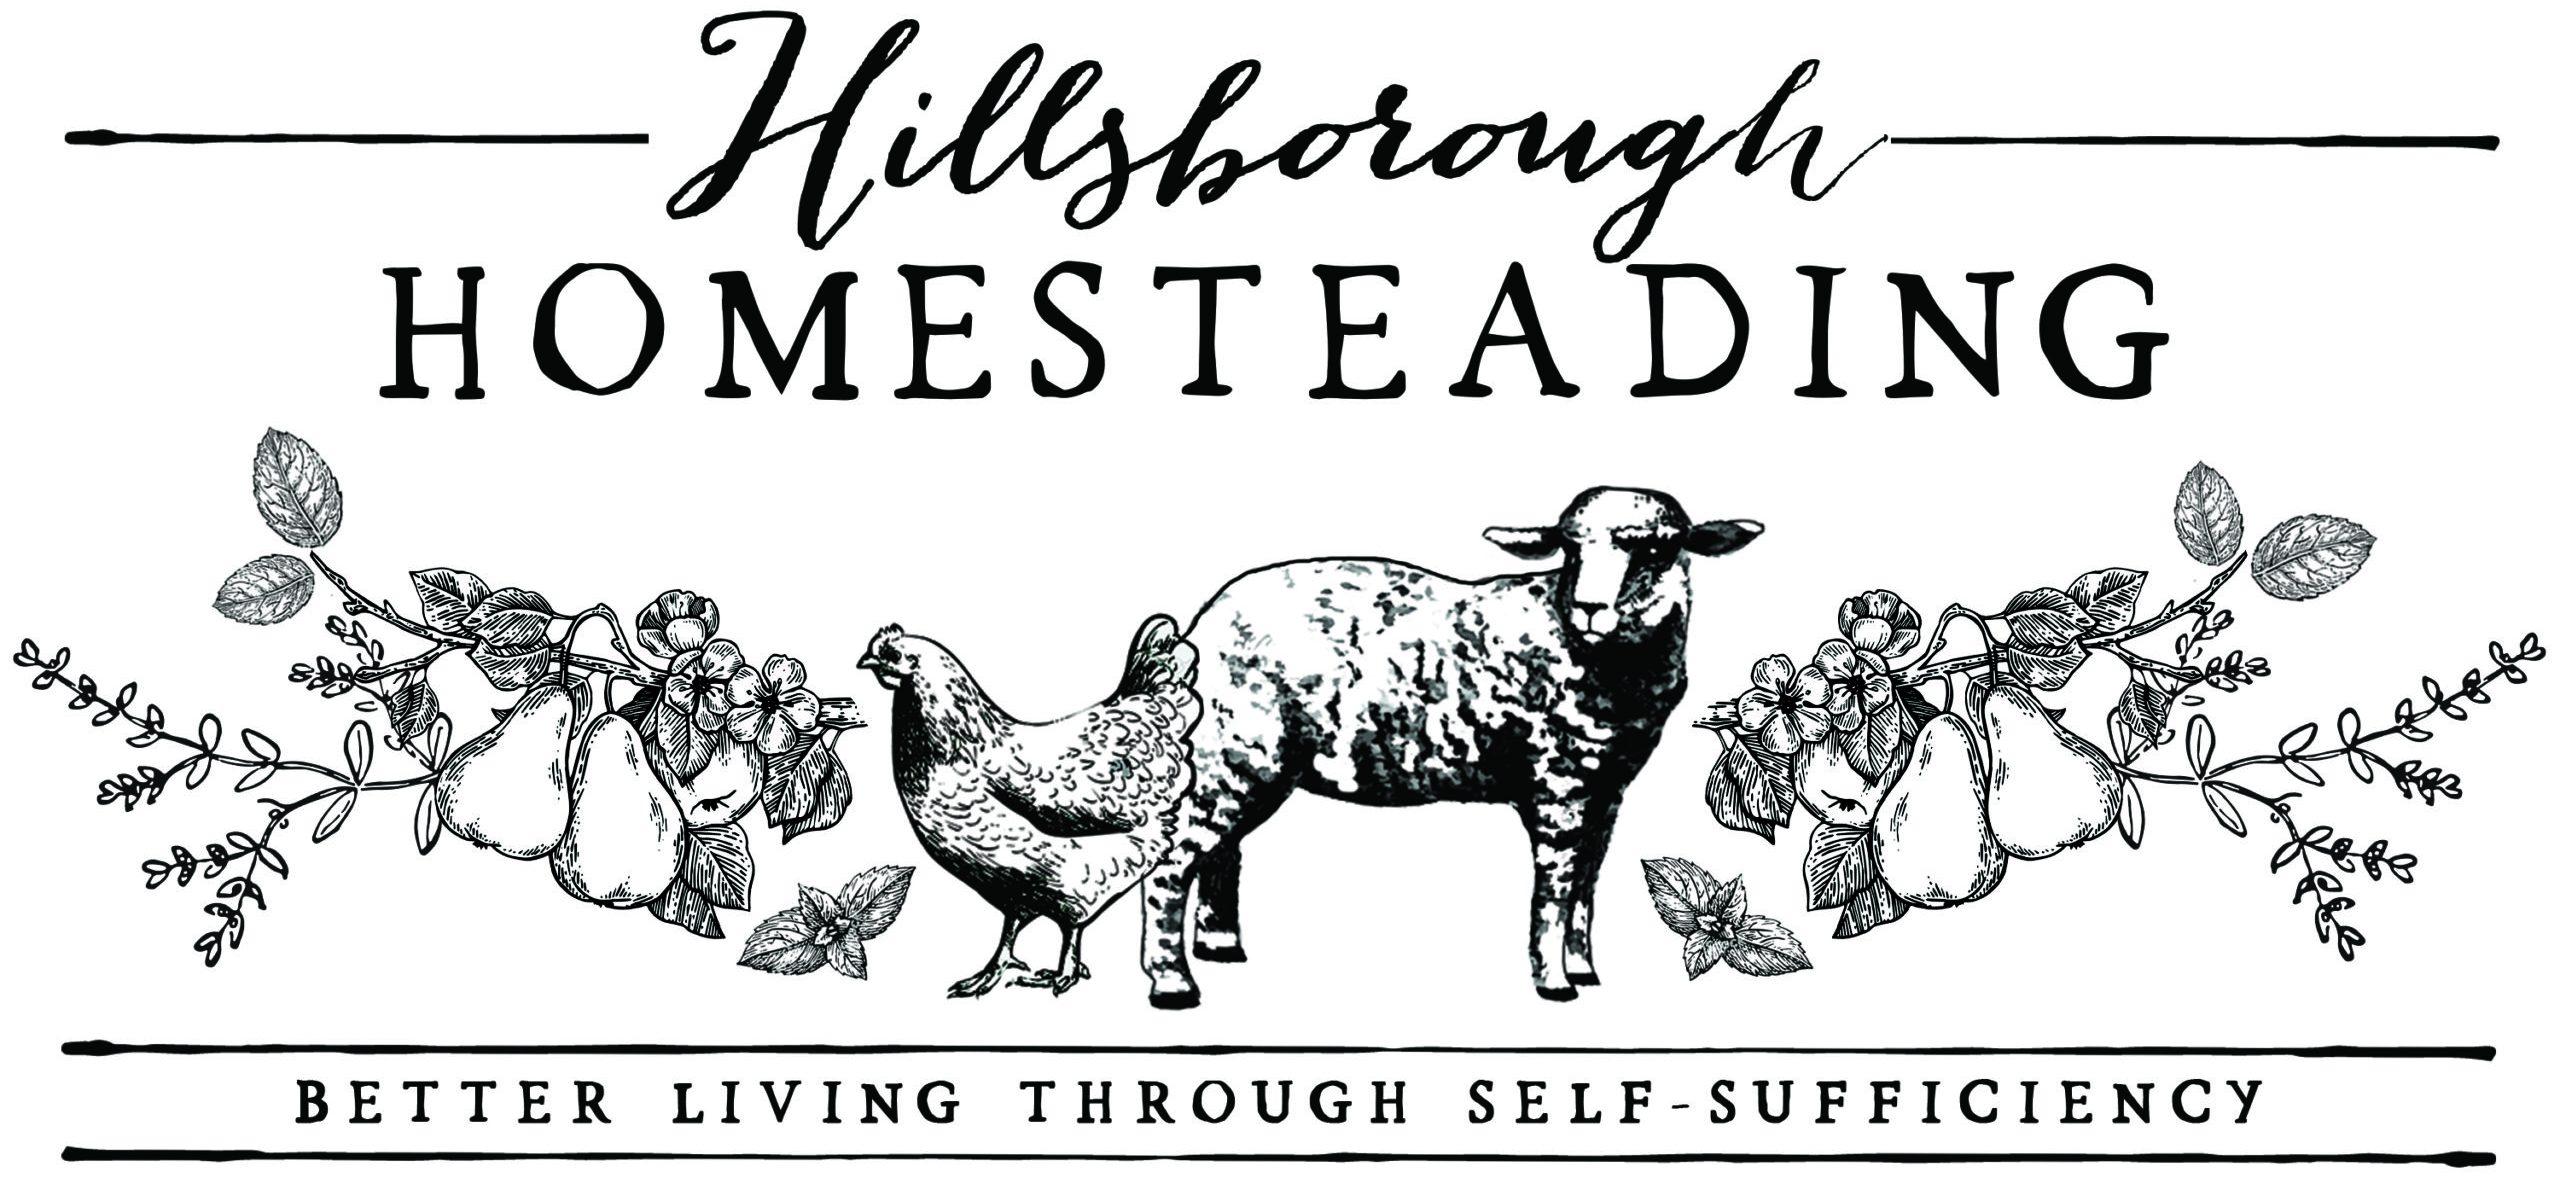 Hillsborough Homesteading